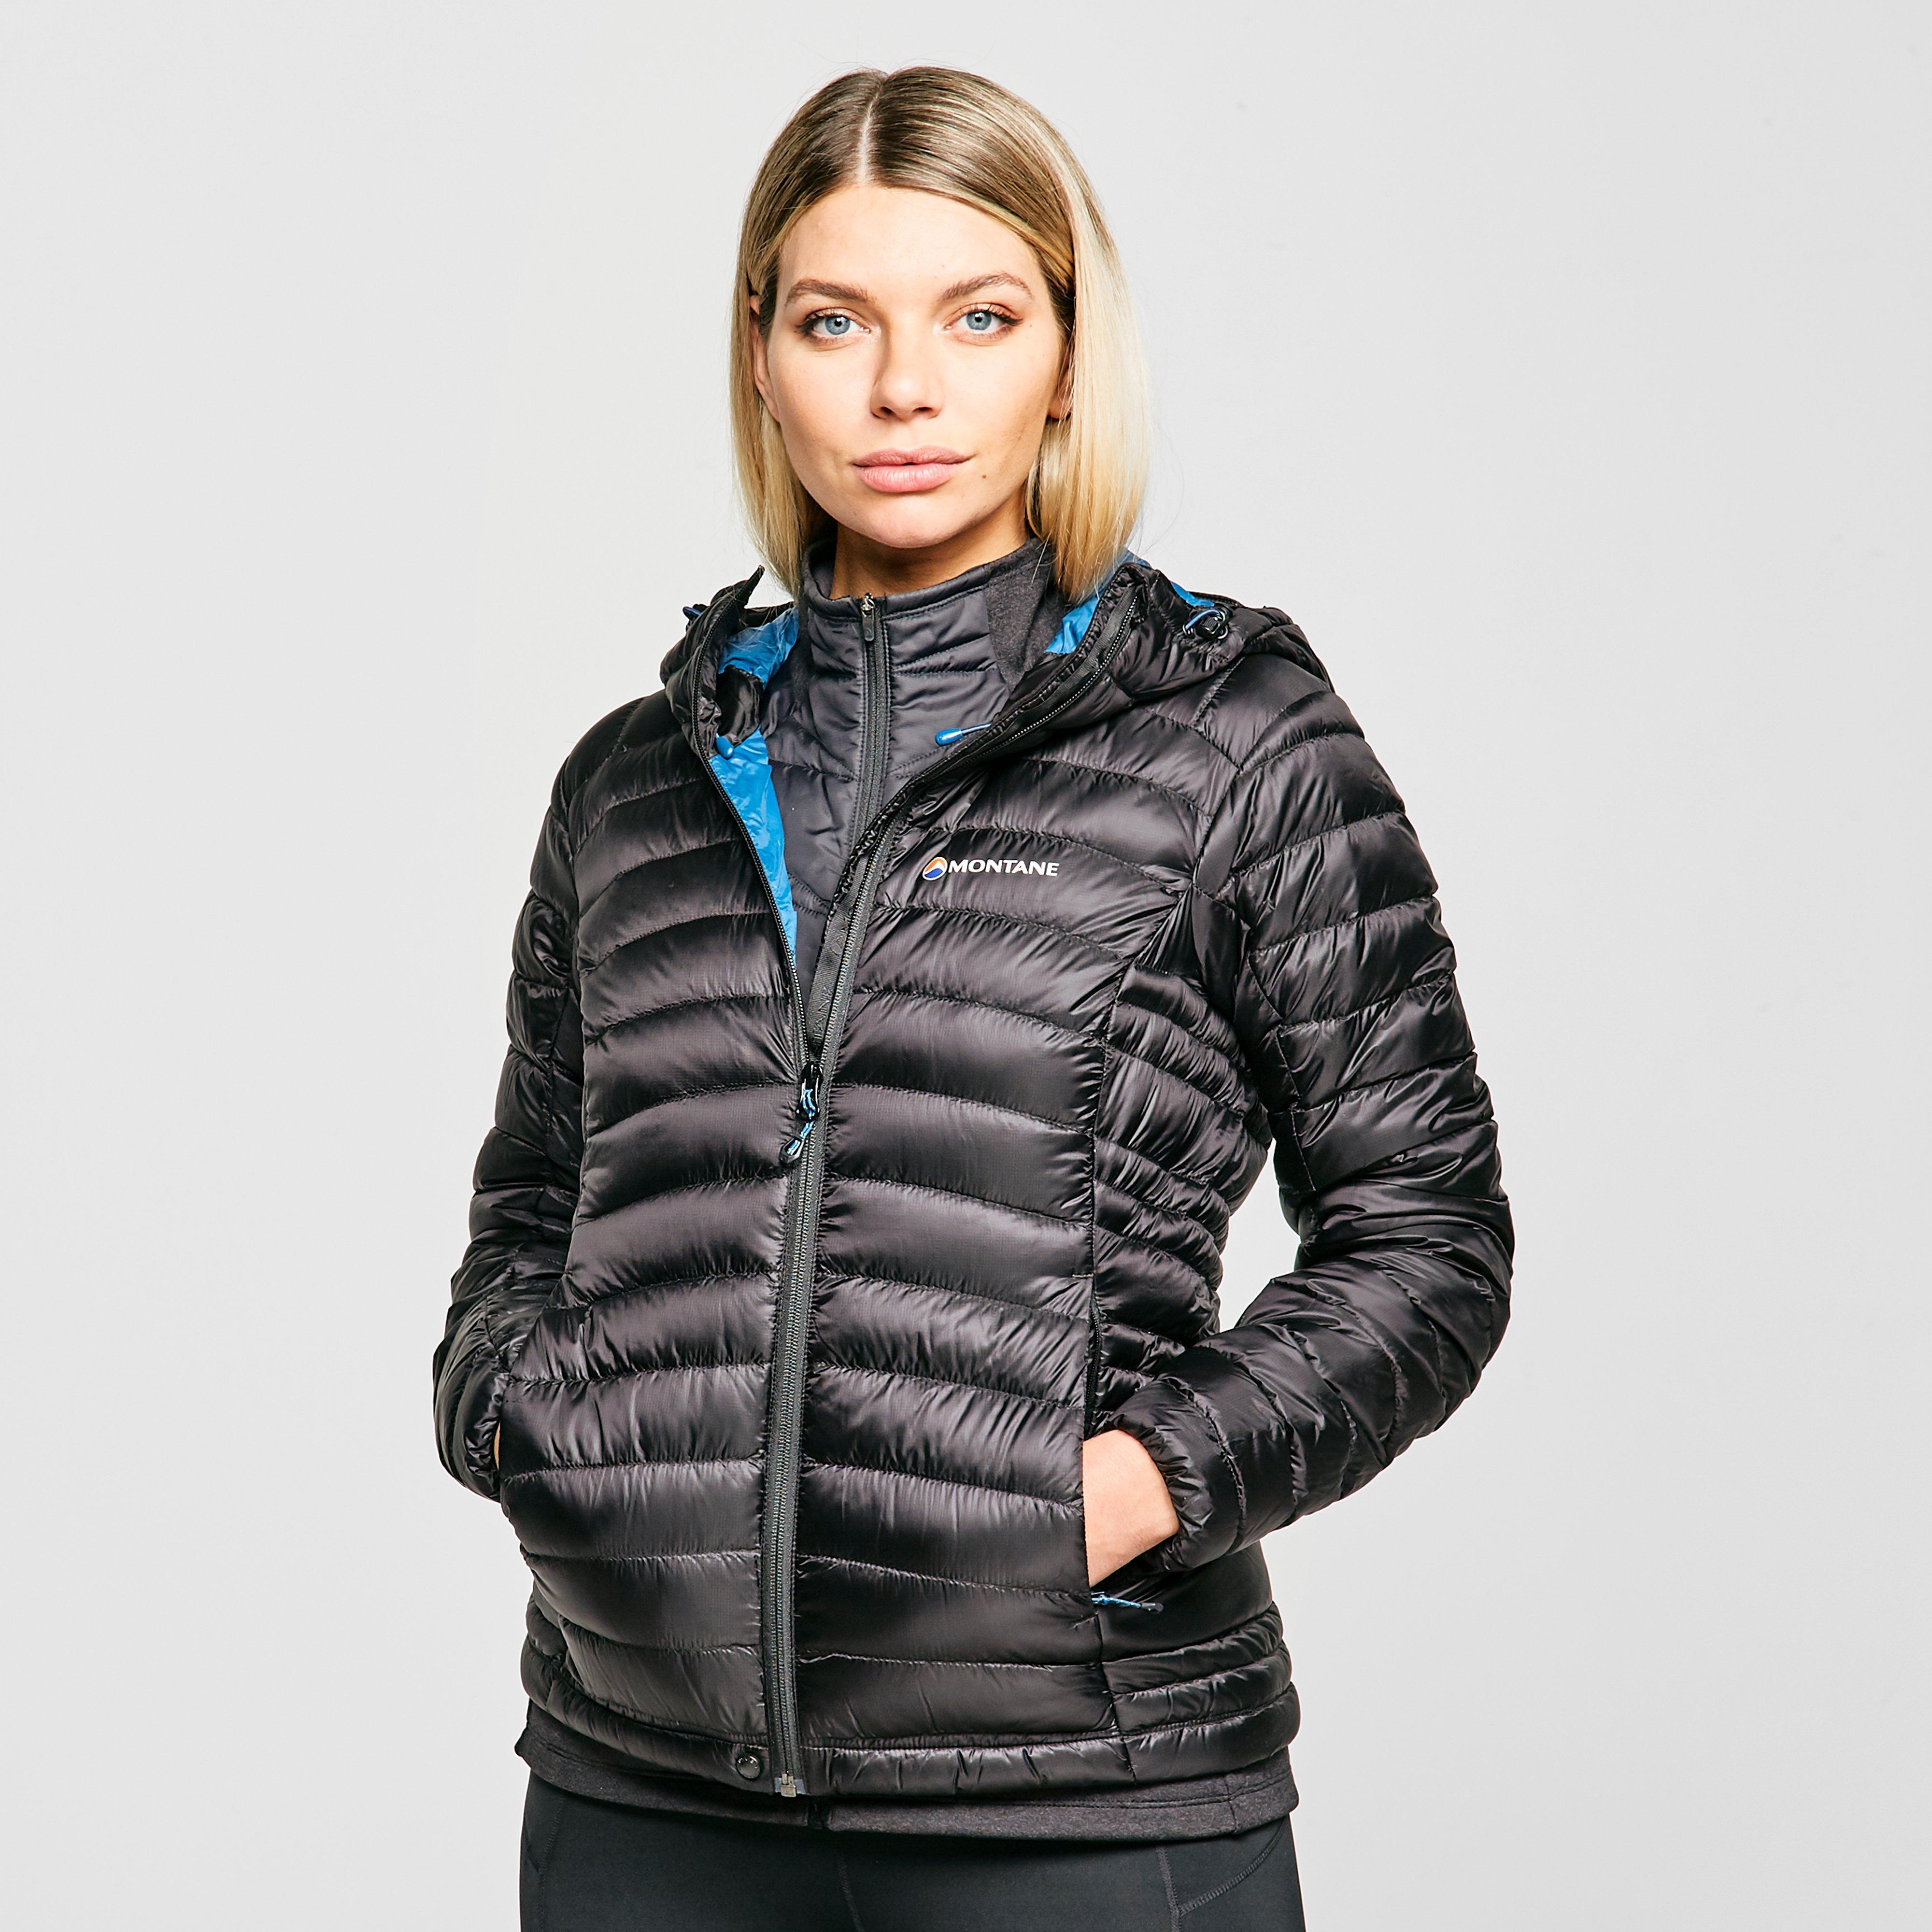 Montane Montane womens Featherlite Down Jacket